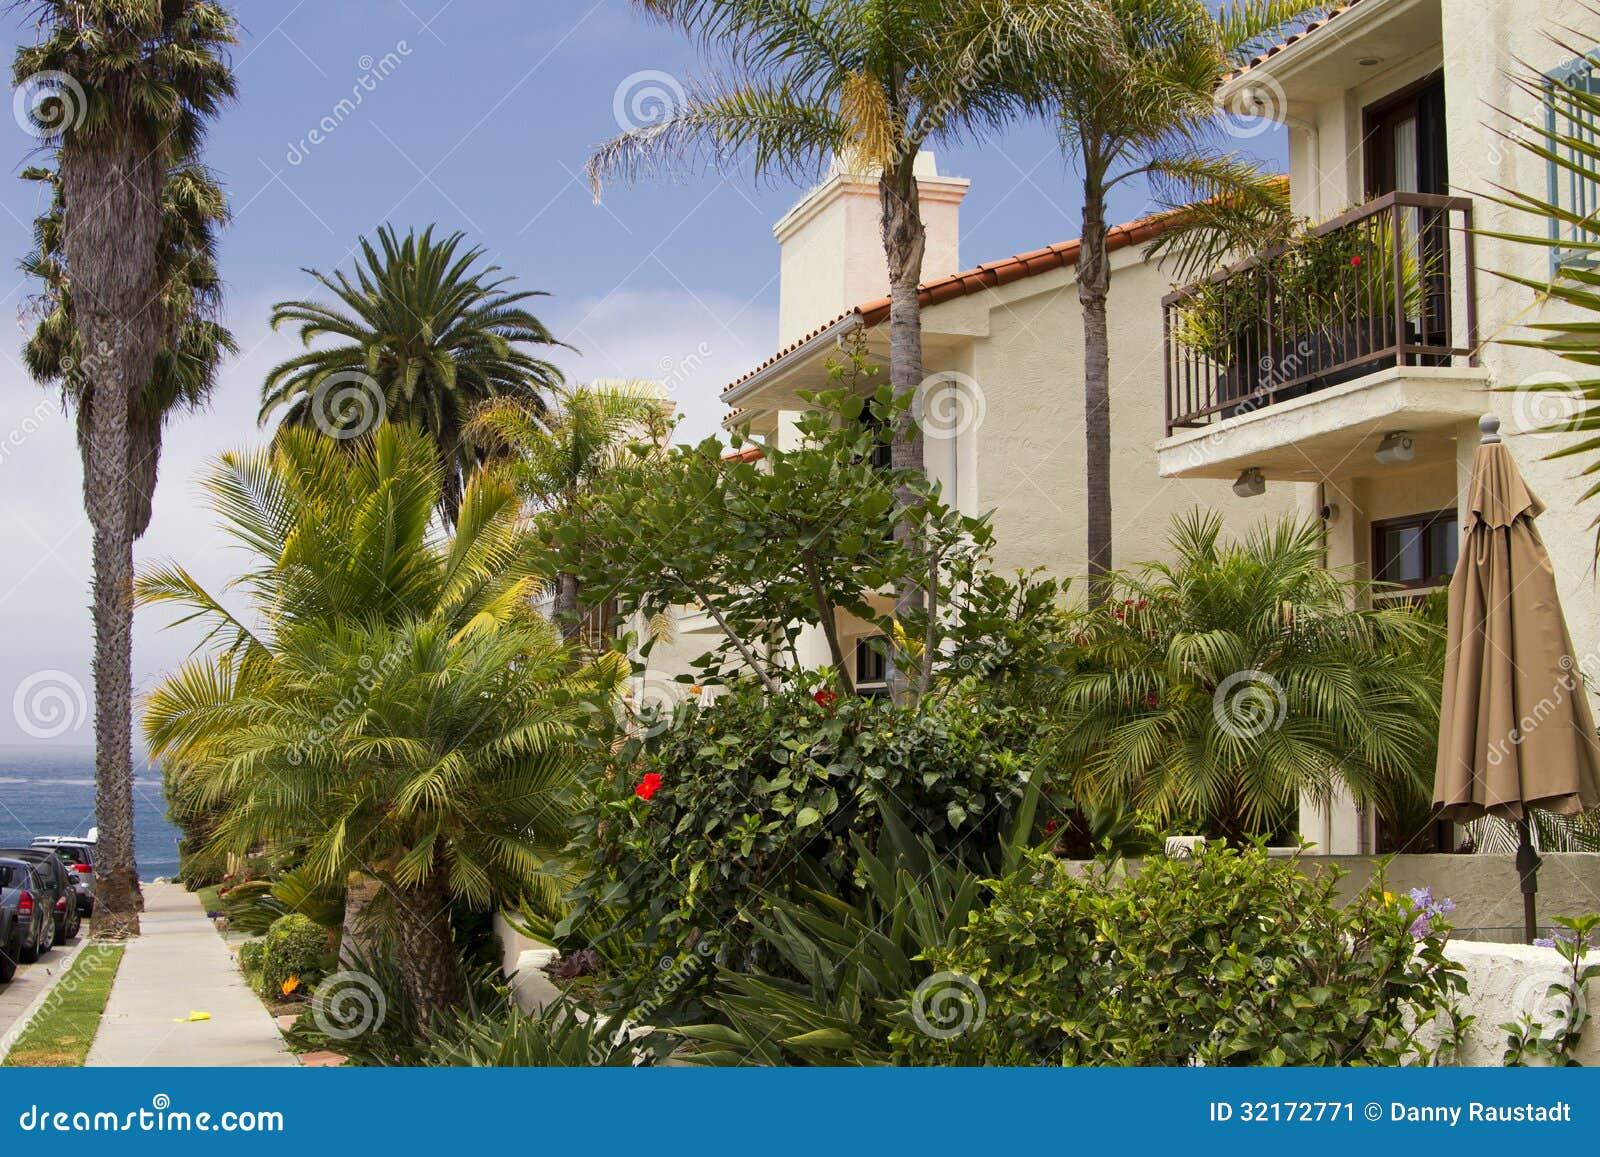 Southern California Ocean Beach Homes Stock Image Image 32172771